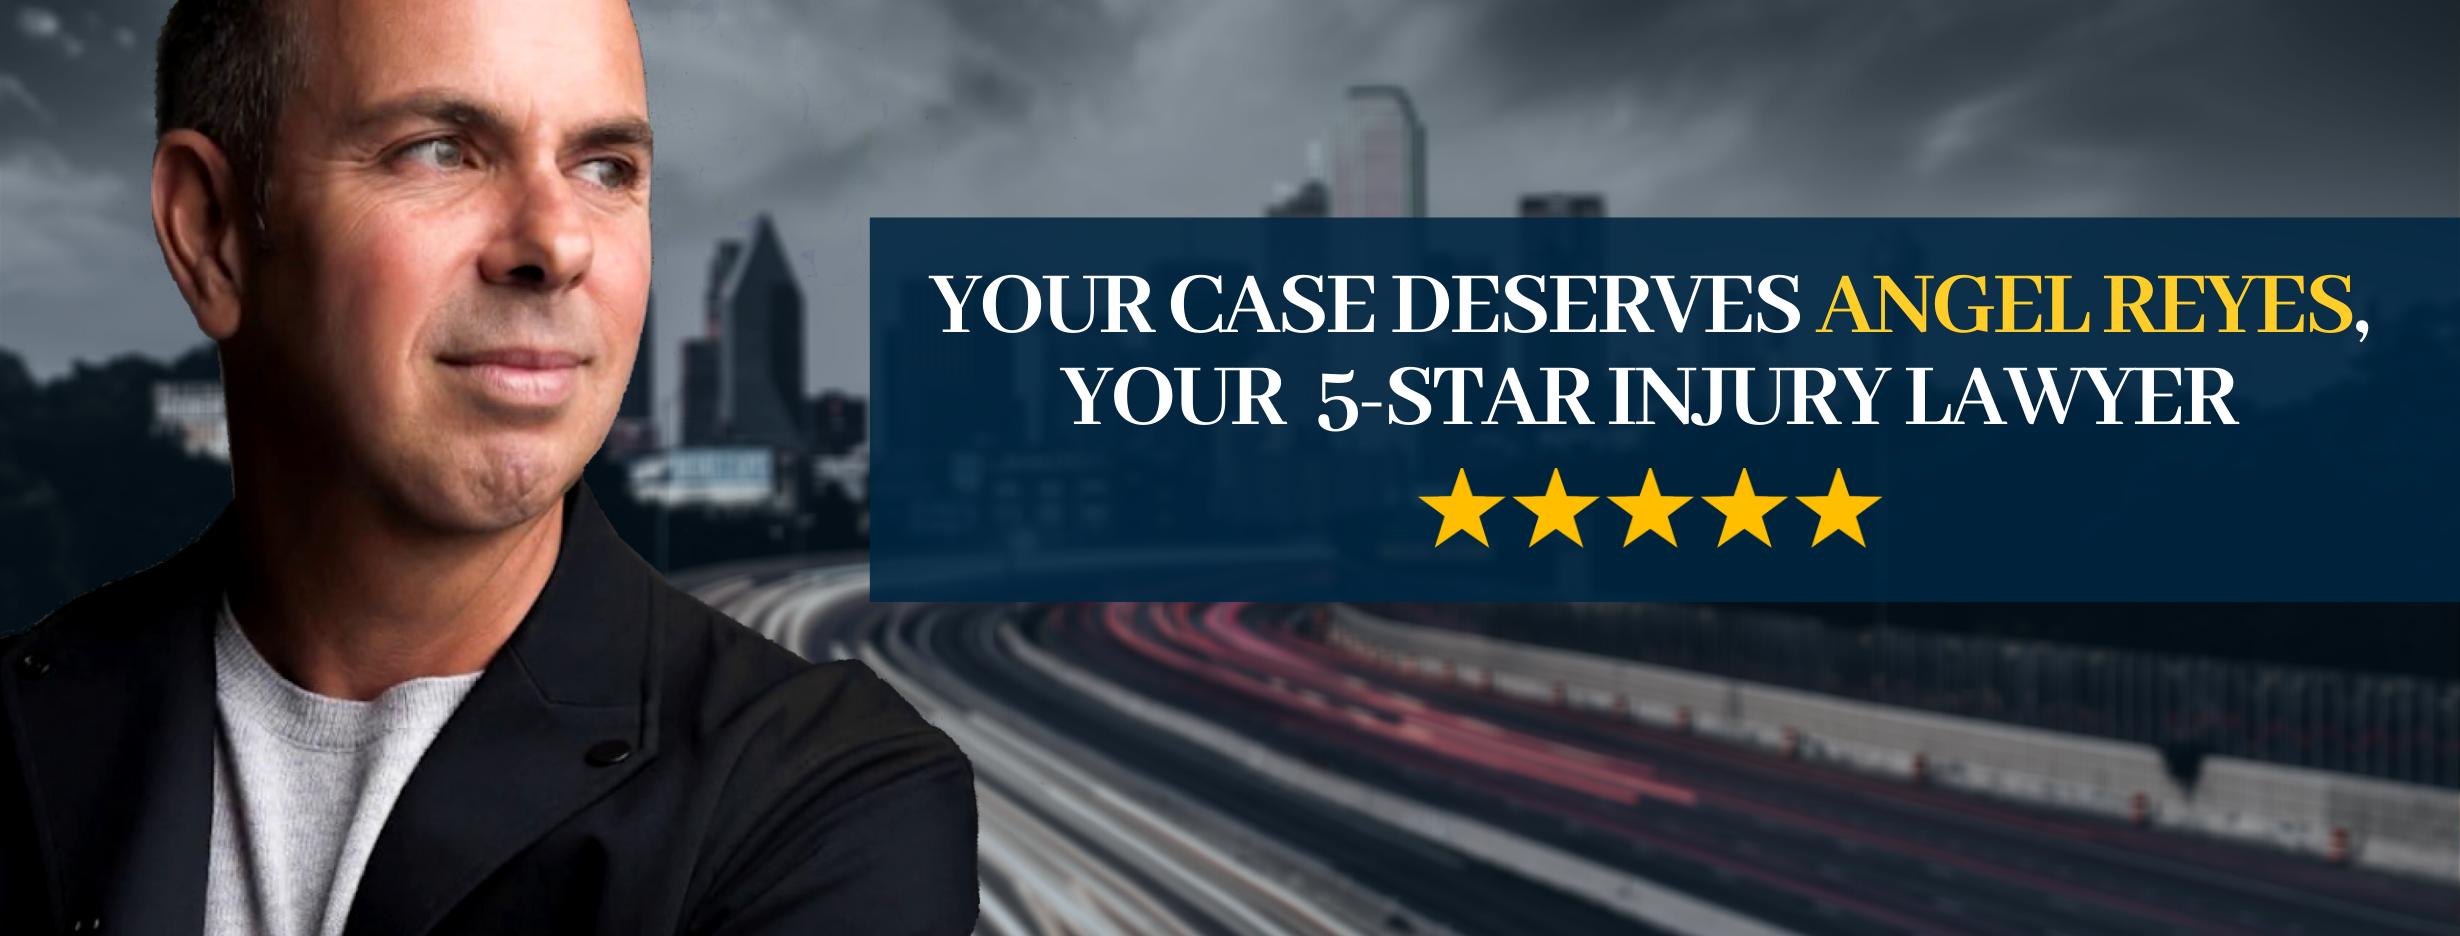 Reyes Browne Reilley Law Firm reviews   Business Law at 8222 Douglas Avenue, Ste. 400 - Dallas TX